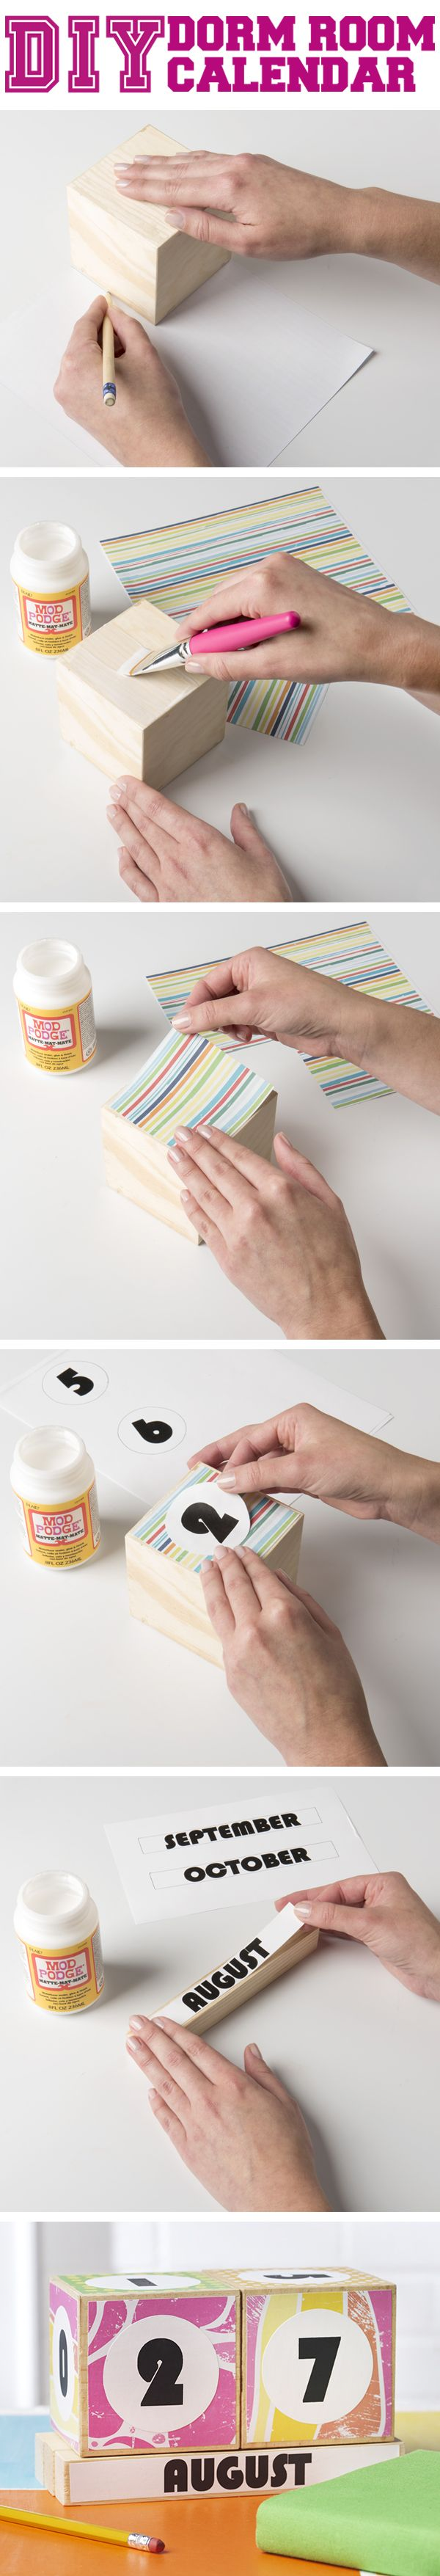 The Ultimate DIY Dorm Room Makeover with Mod Podge! Adorable Block Calendar!